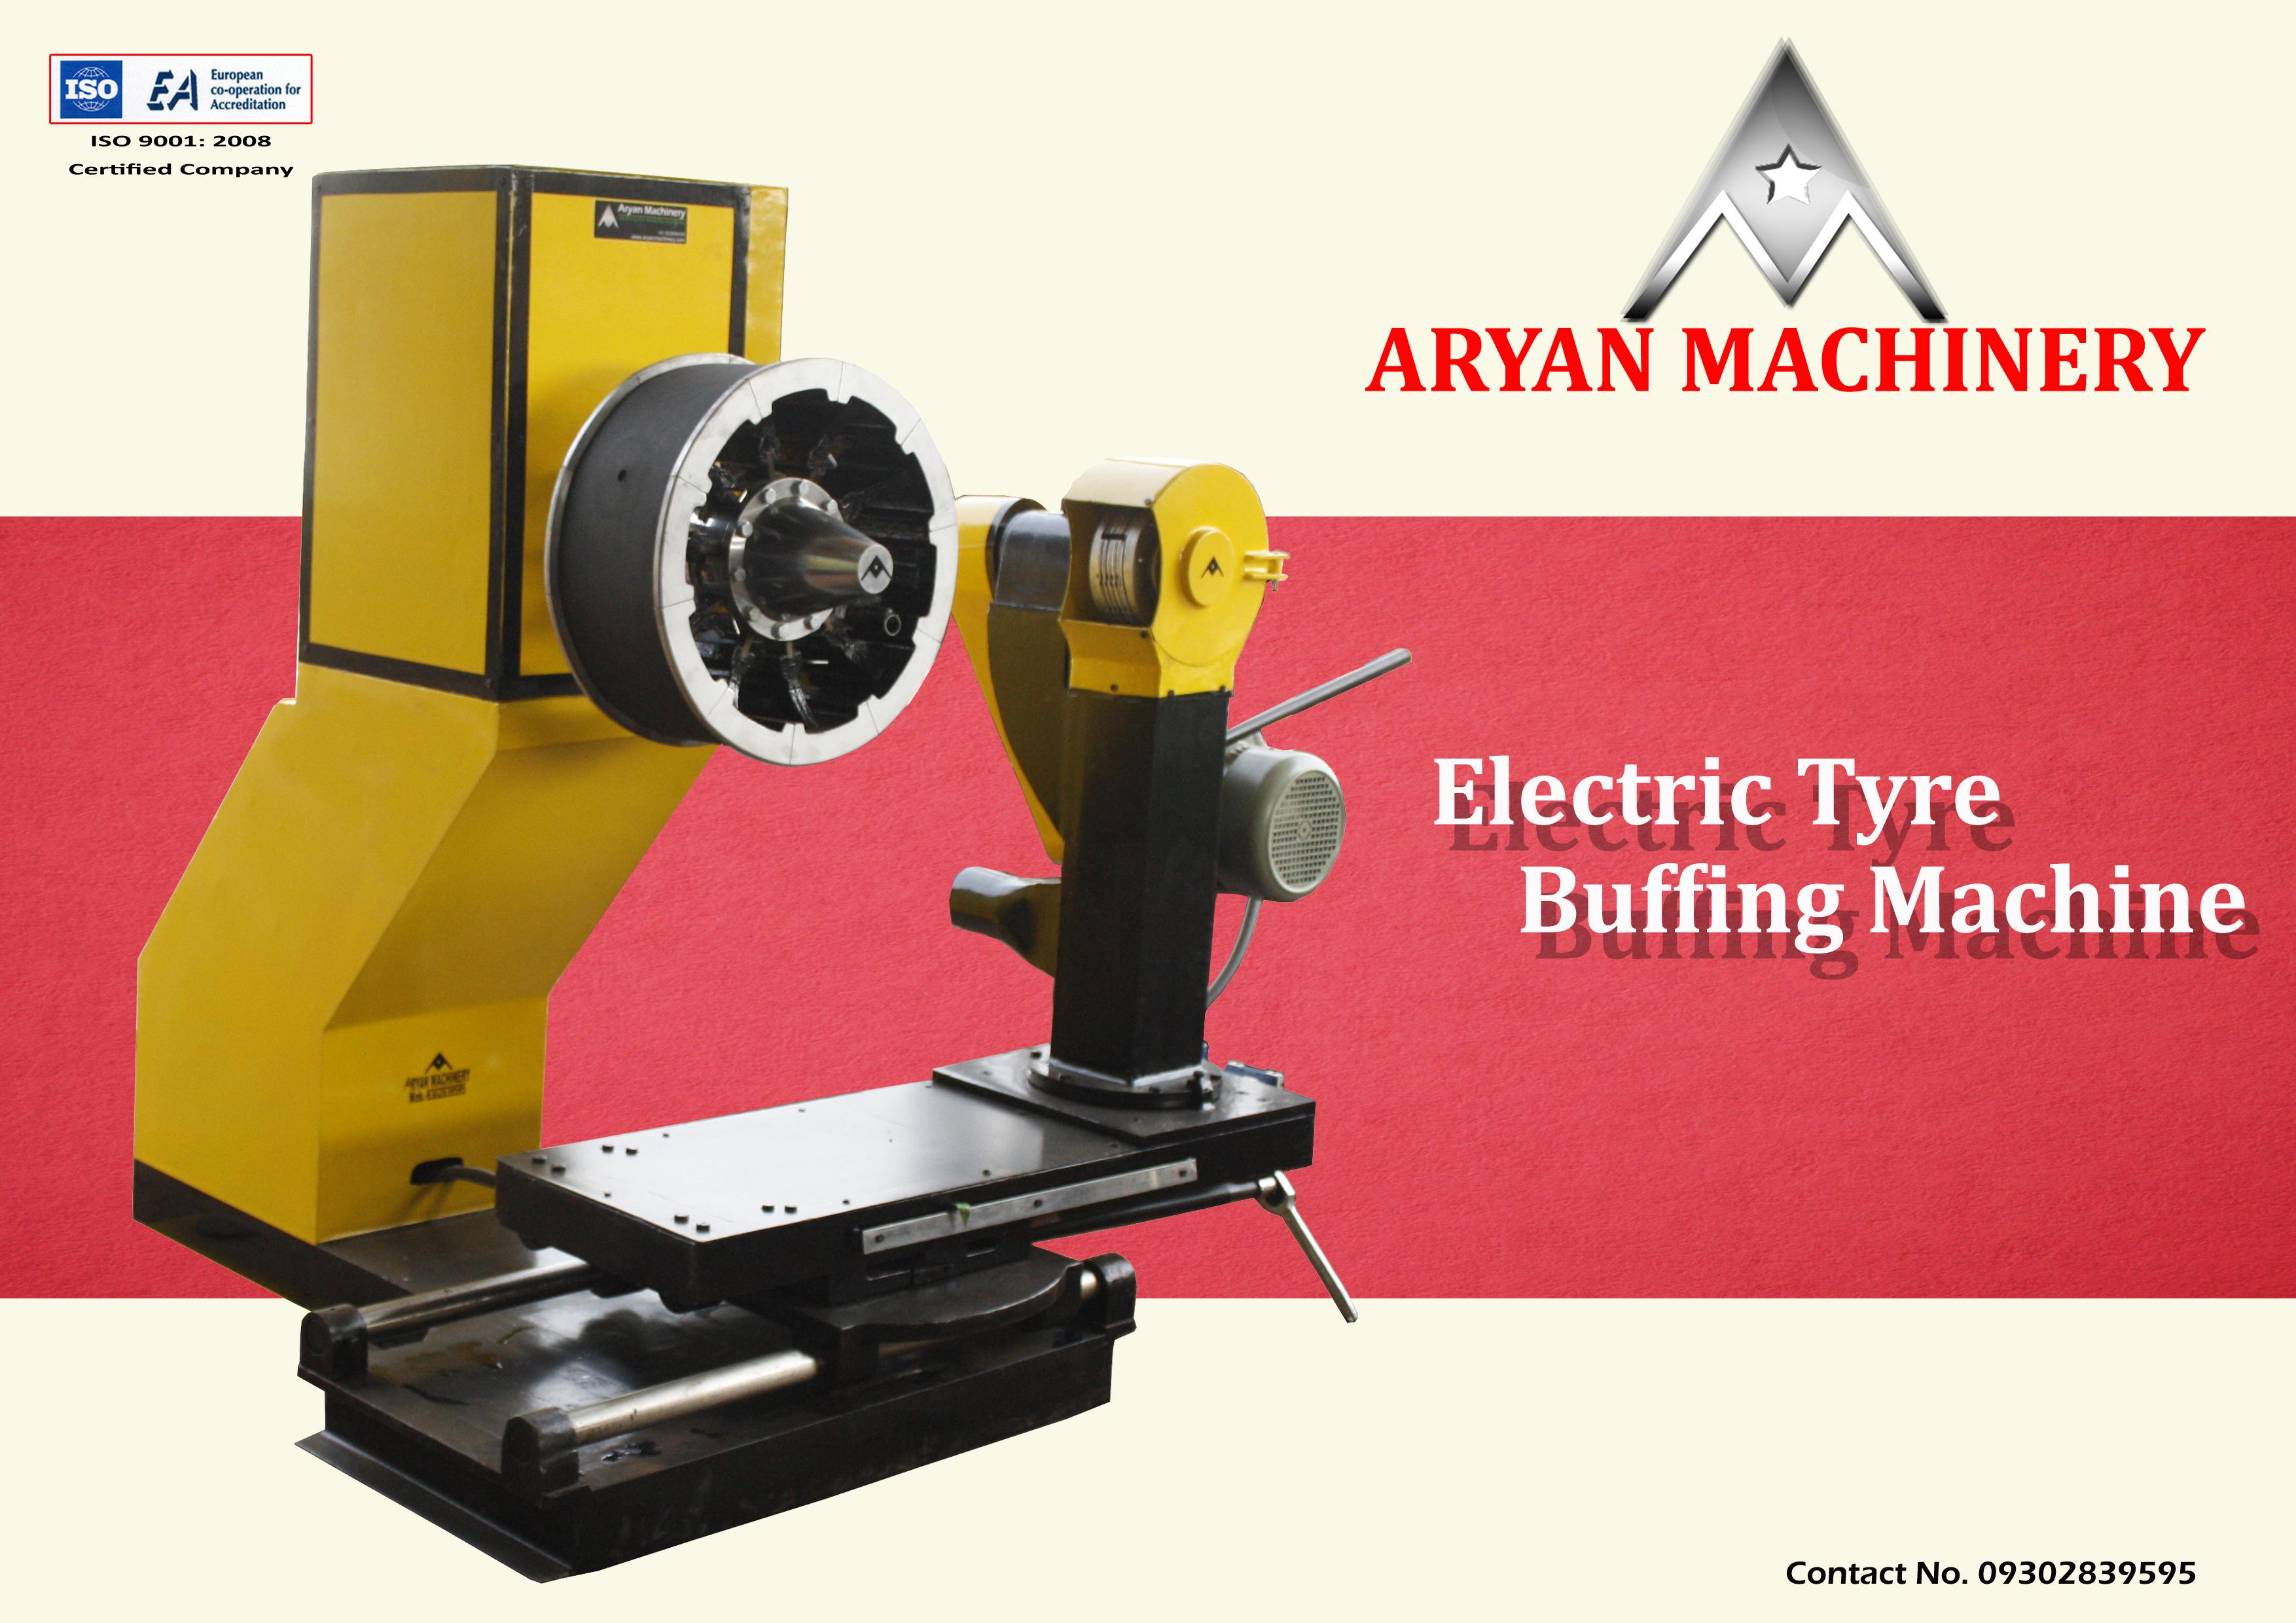 Tyre Buffing Machine